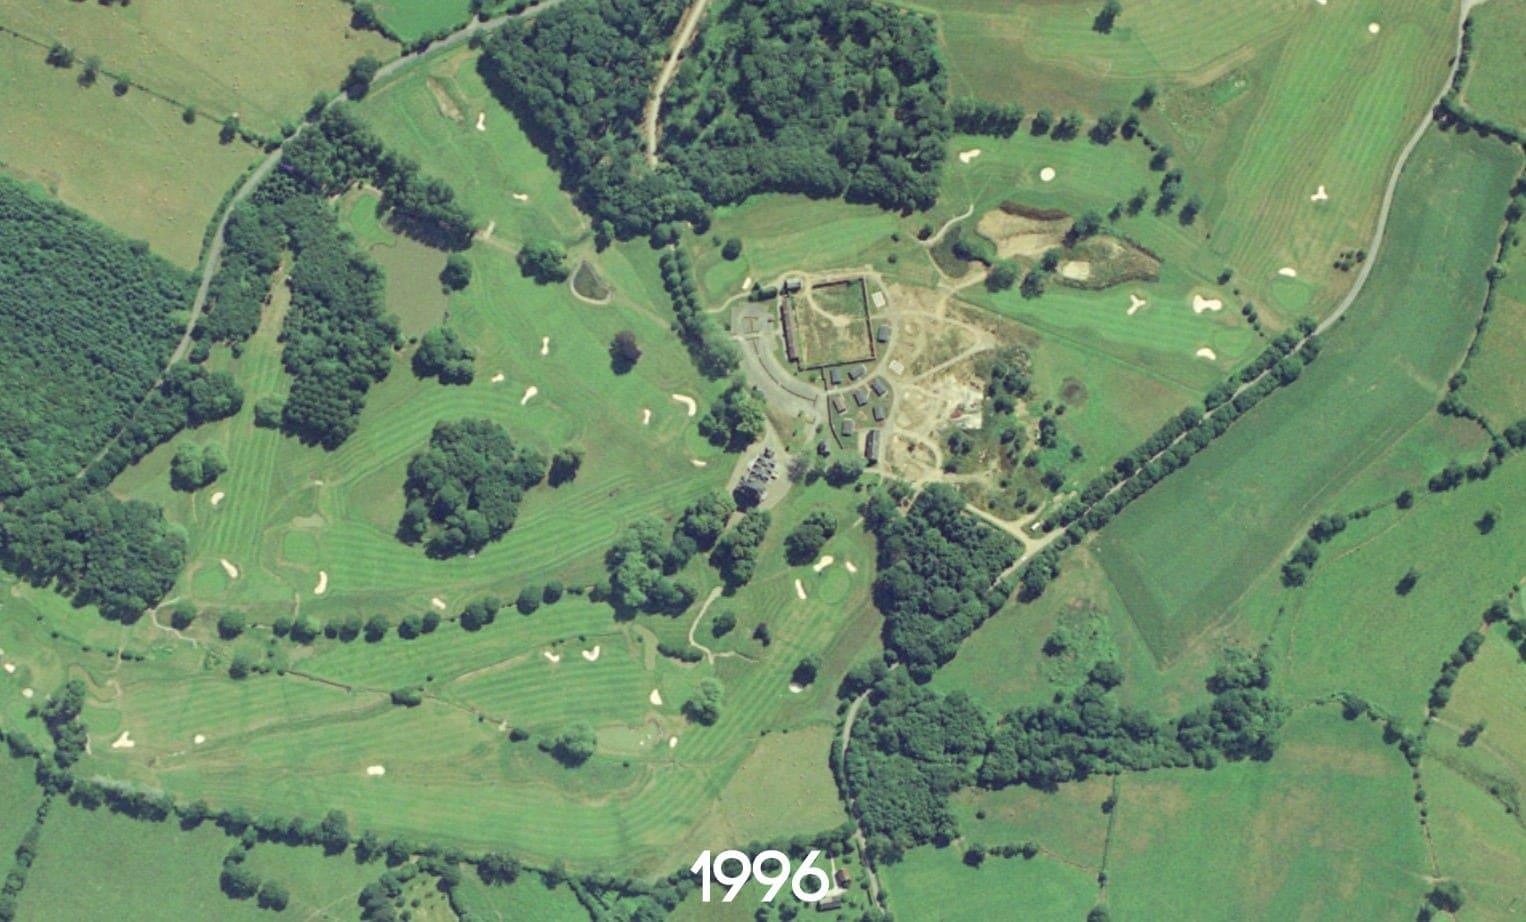 chateau-marko-bey-before-map-1996